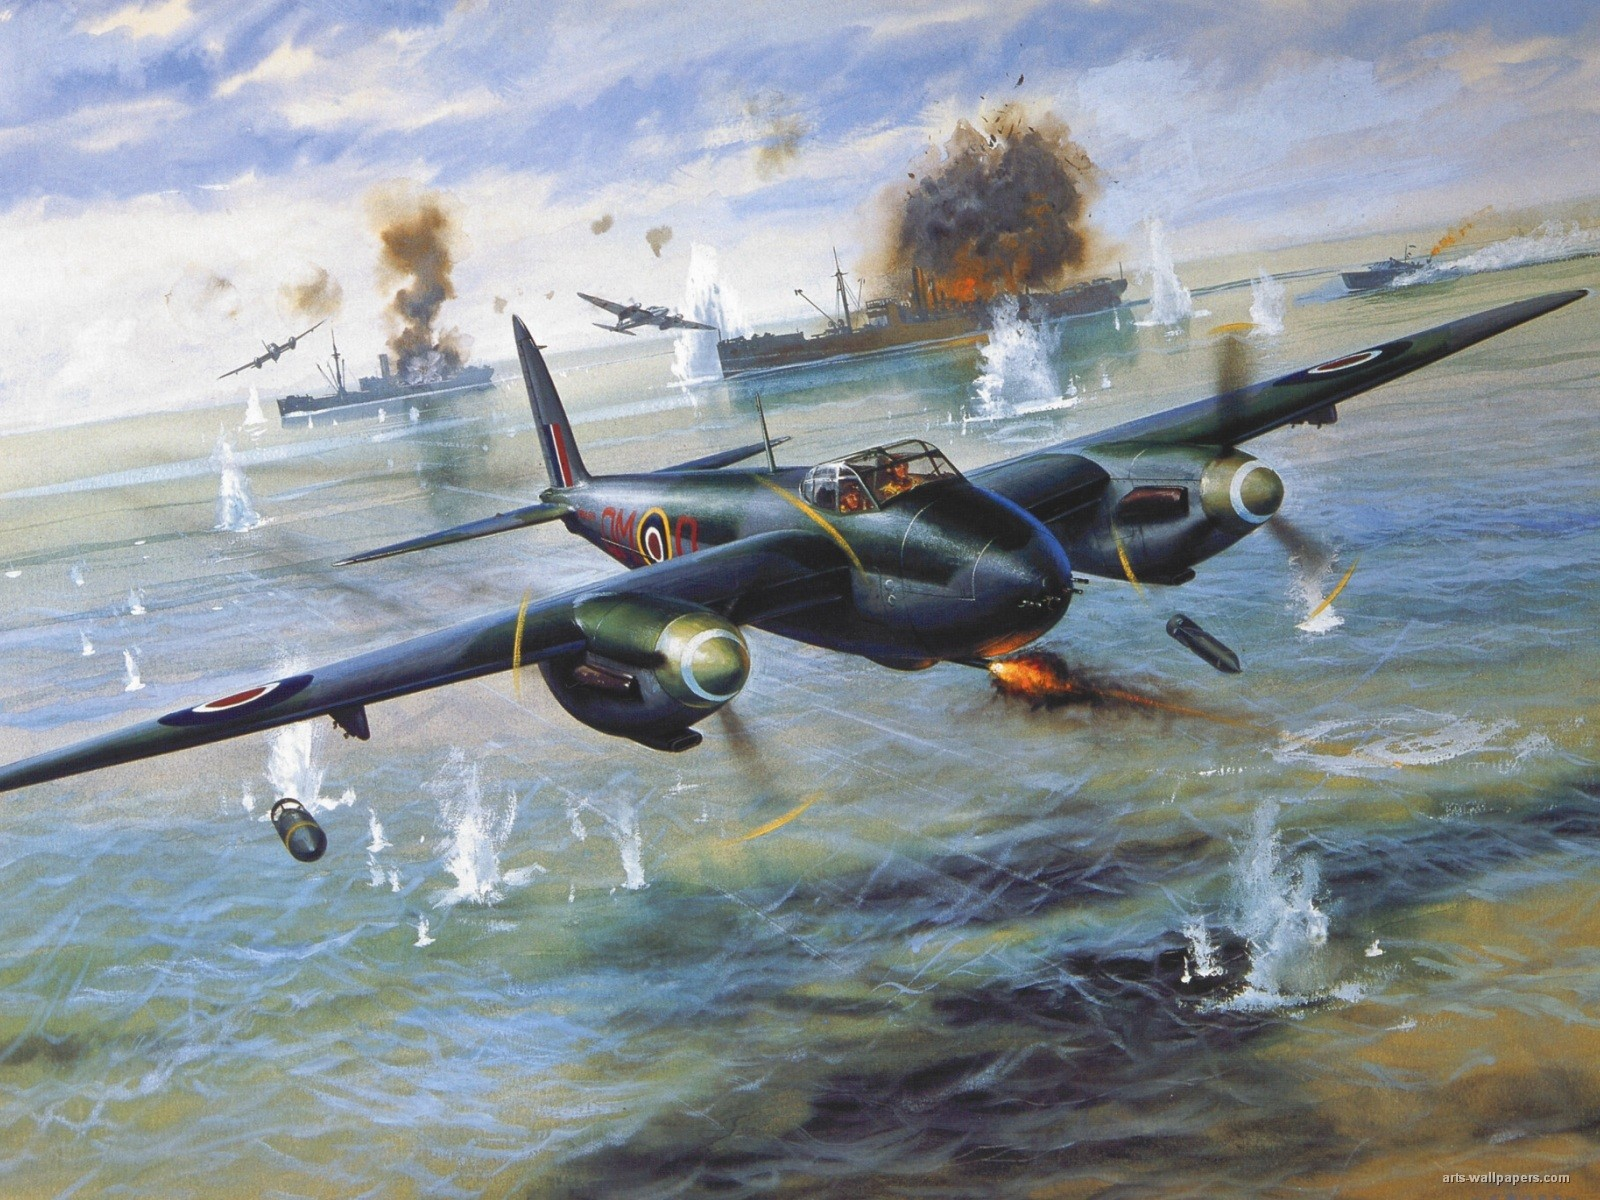 http://1.bp.blogspot.com/-zAIAWANKiHk/UGYUc6nM2uI/AAAAAAAABmY/dcydvY2iZGk/s1600/ww2-planes+(69).jpg